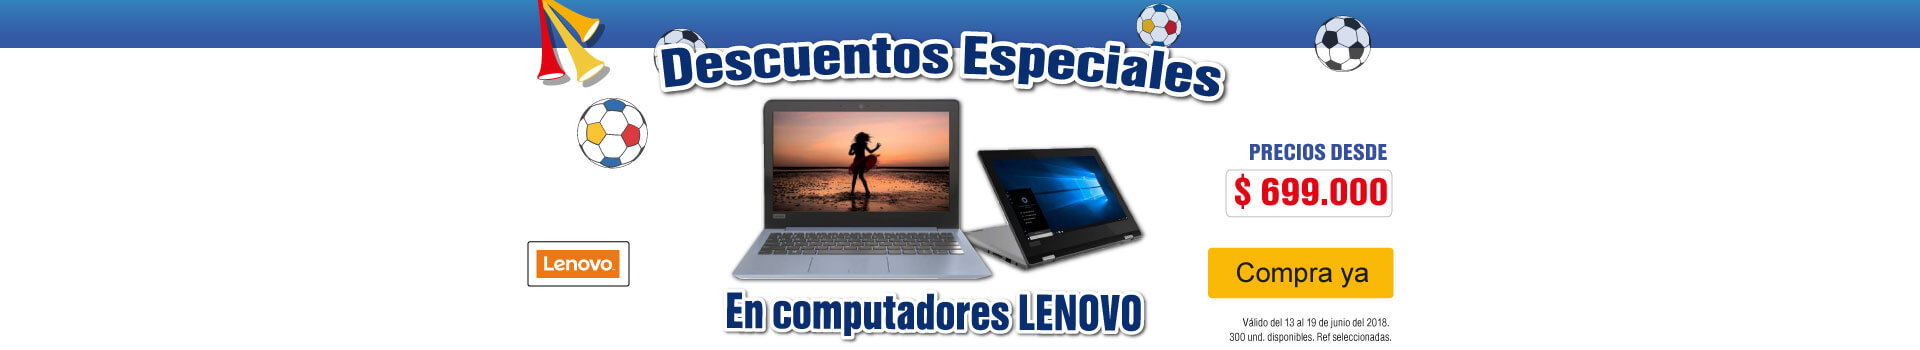 AK-KT-HIPER-2-computadores y tablets-portatiles-DCAT---Lenovo-Precios desde $699.000-Jun14